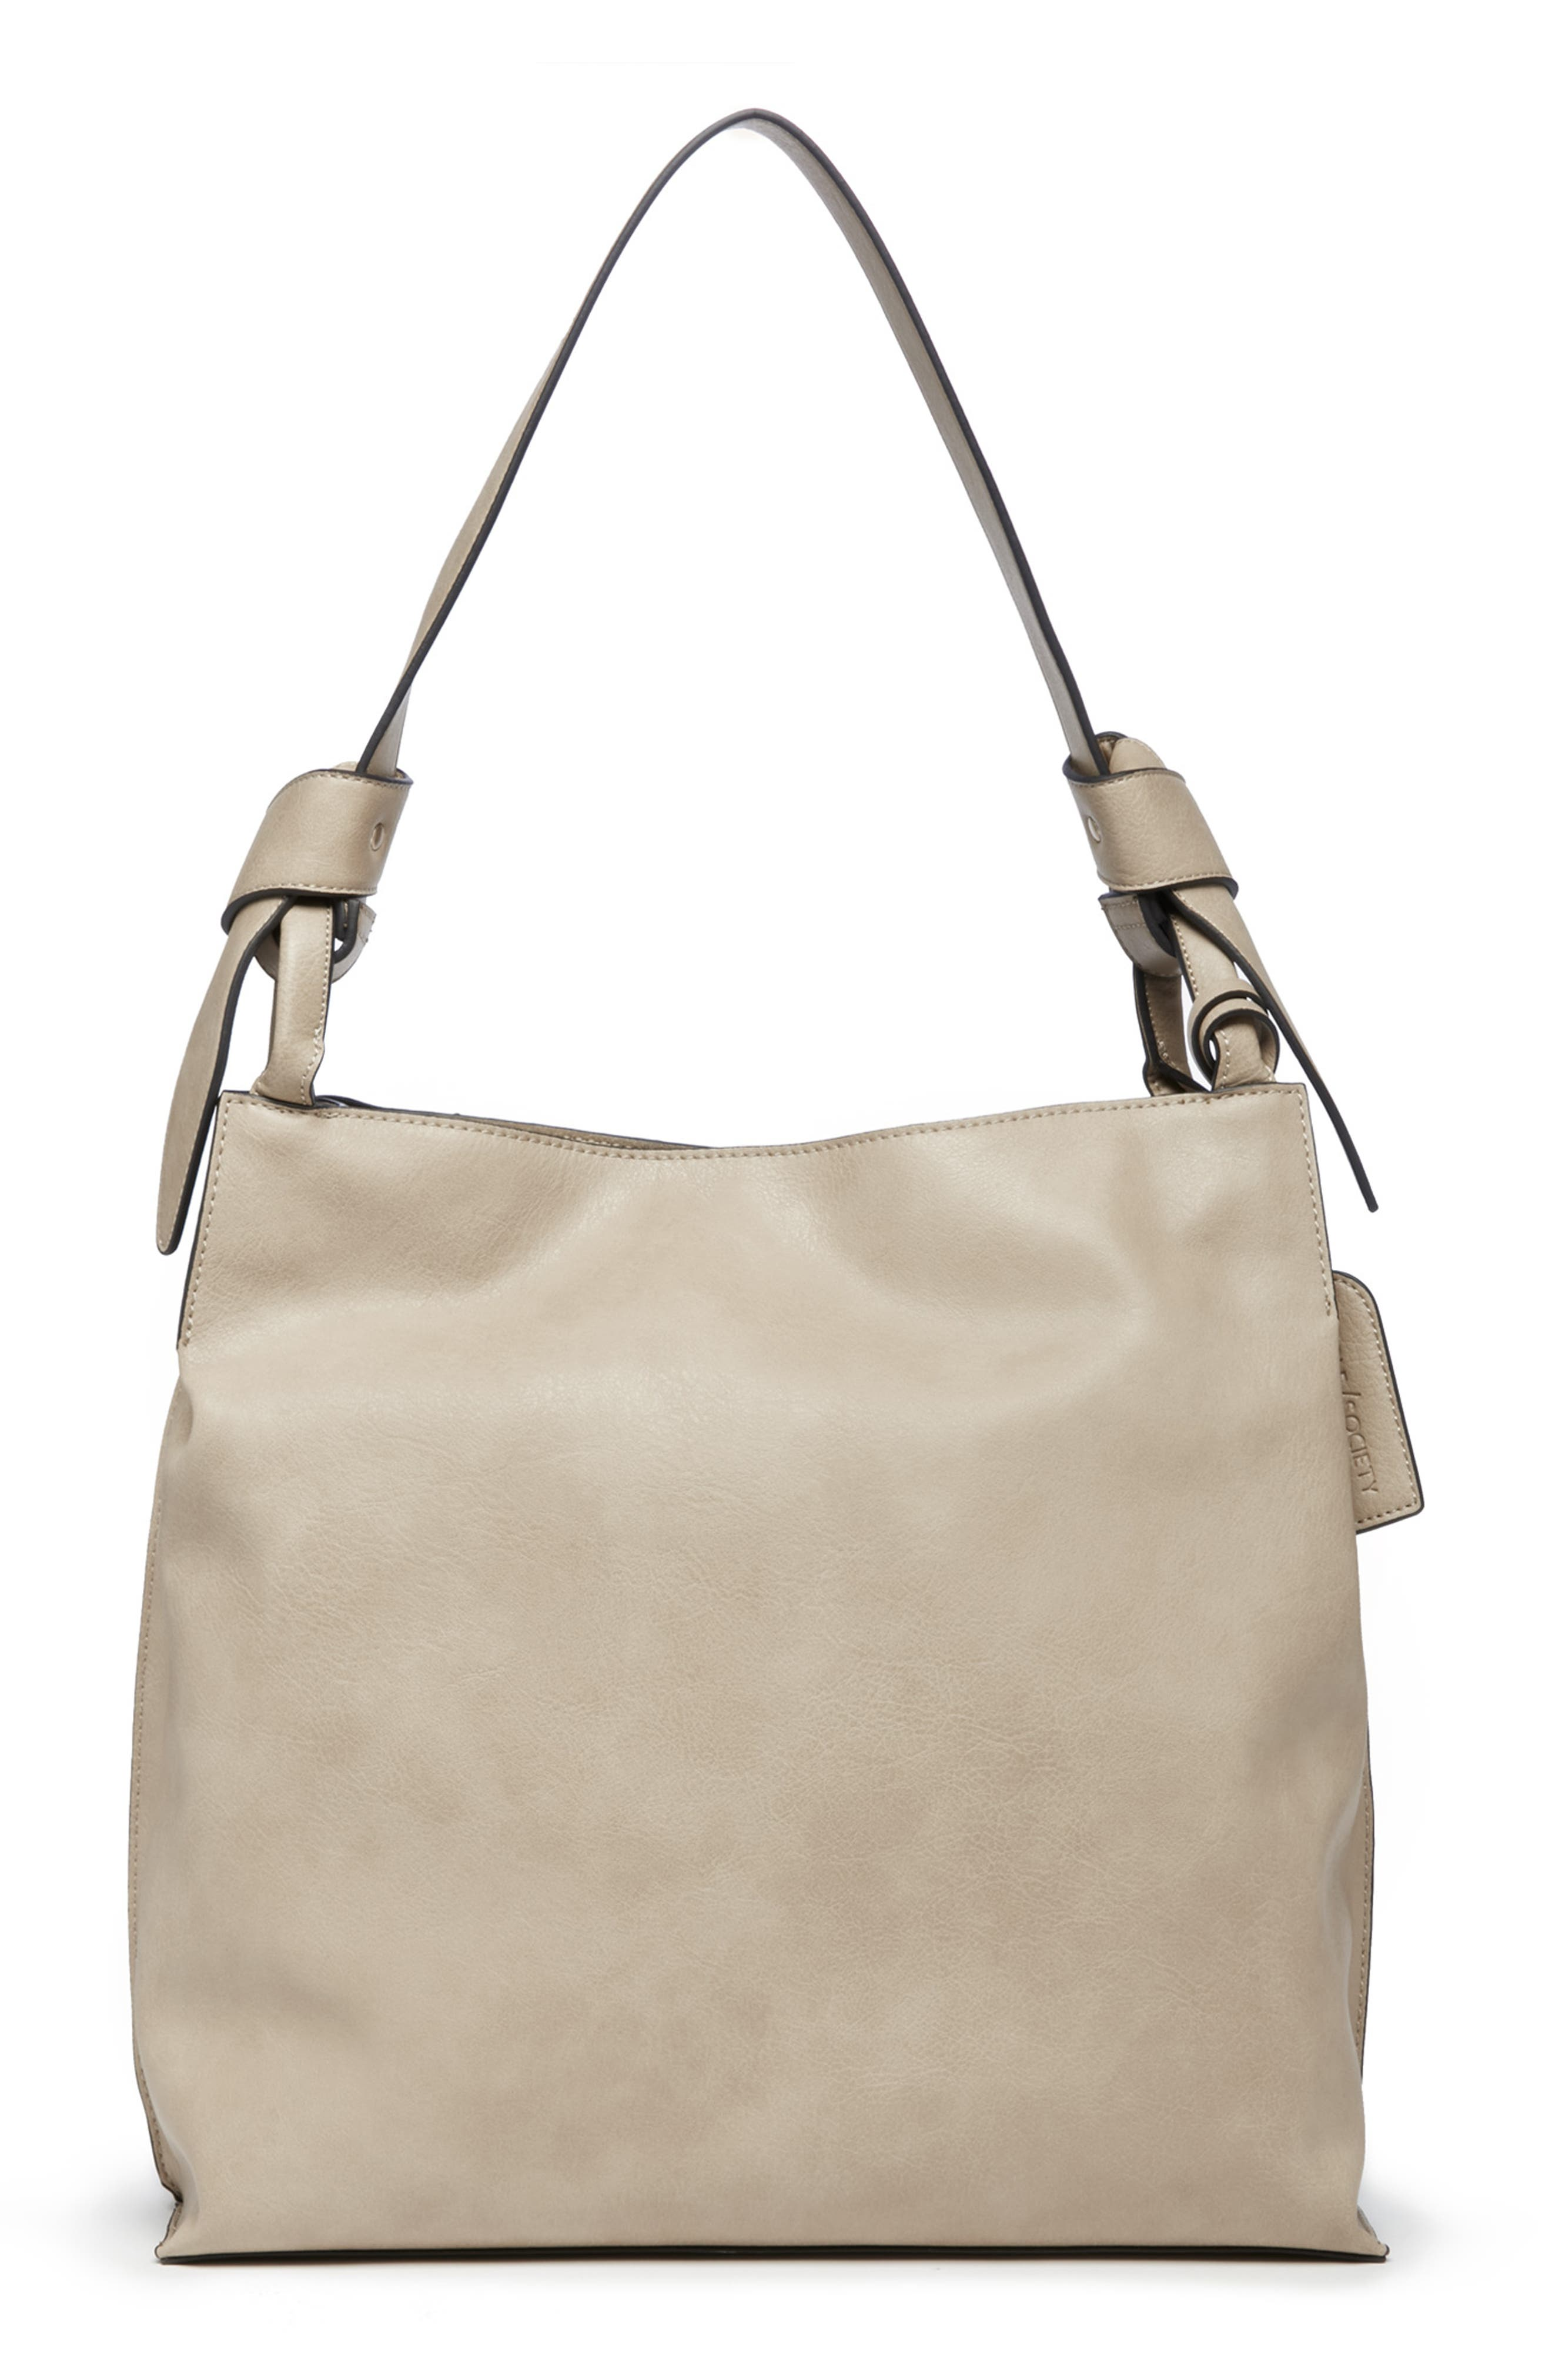 Josah Faux Leather Shoulder Bag,                             Alternate thumbnail 3, color,                             SAFARI